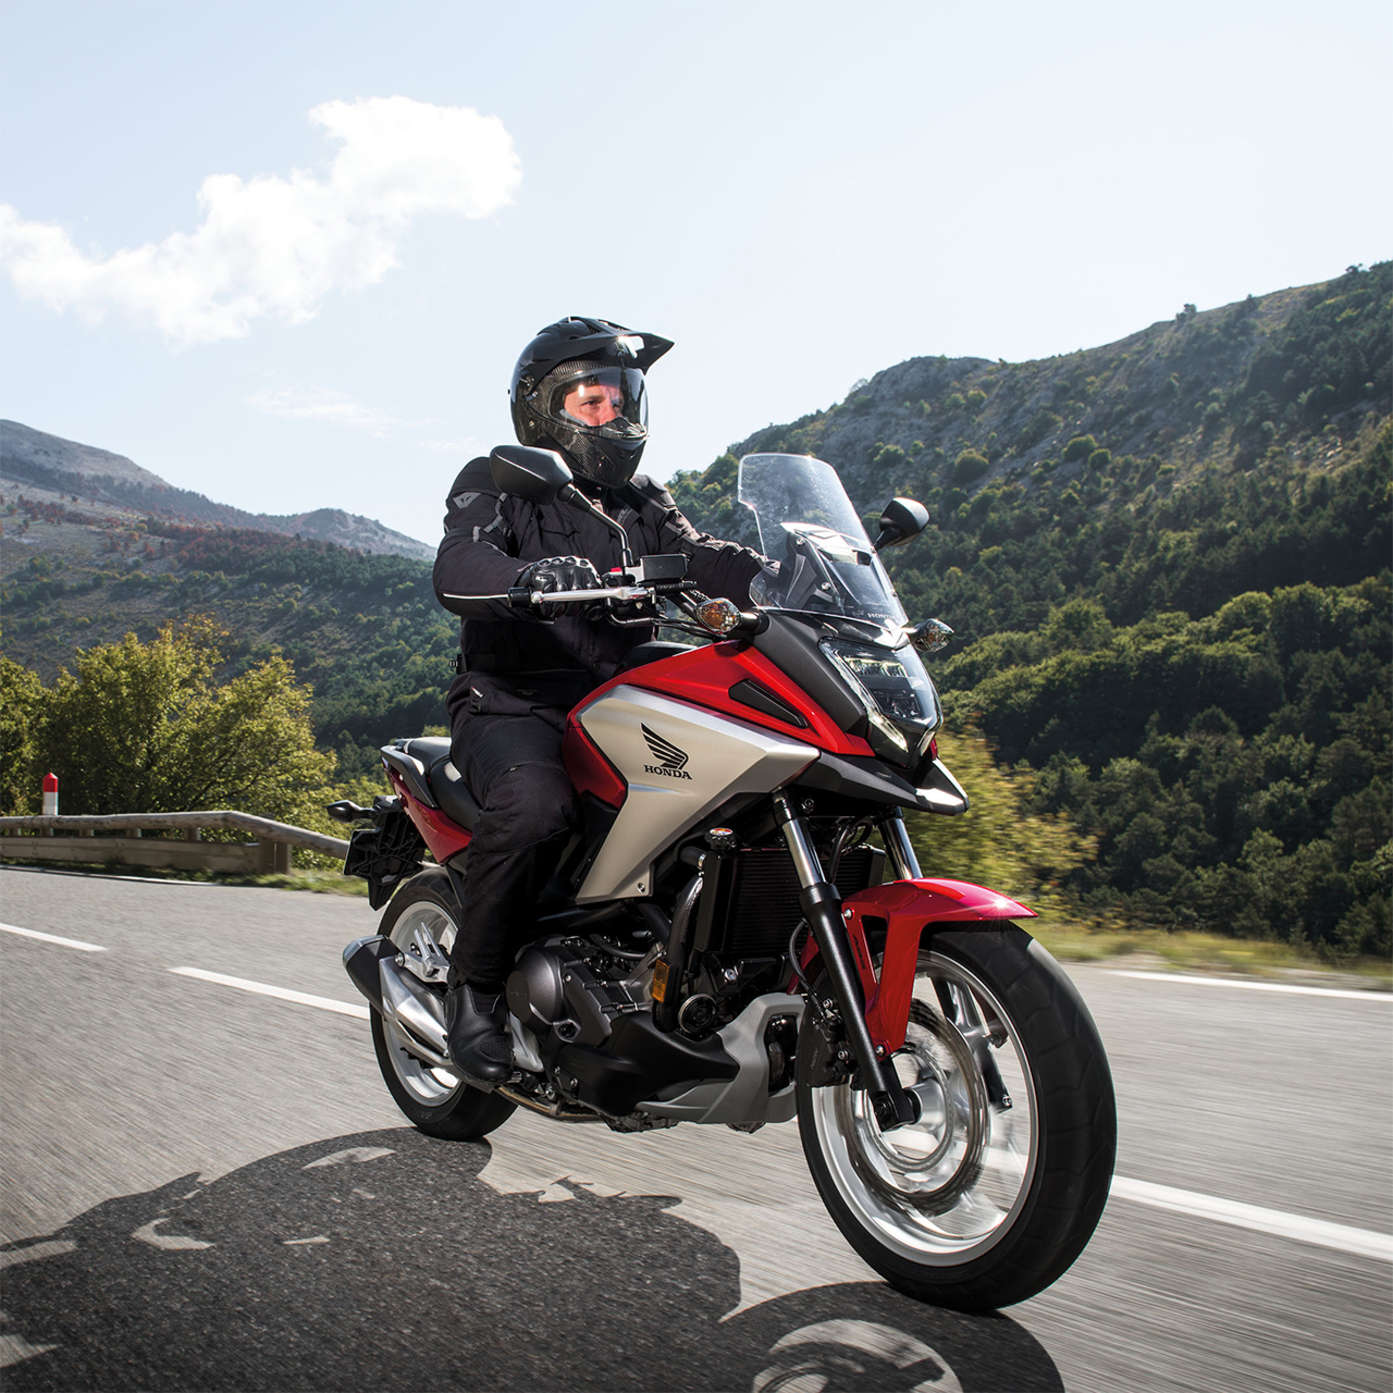 http://www.honda.nl/content/dam/central/motorcycles/adventure/nc750x/NC750X%202016/honda-bikes-2016-adventure-750x-001-1x1-mobile(1).jpg/jcr:content/renditions/fb.jpg